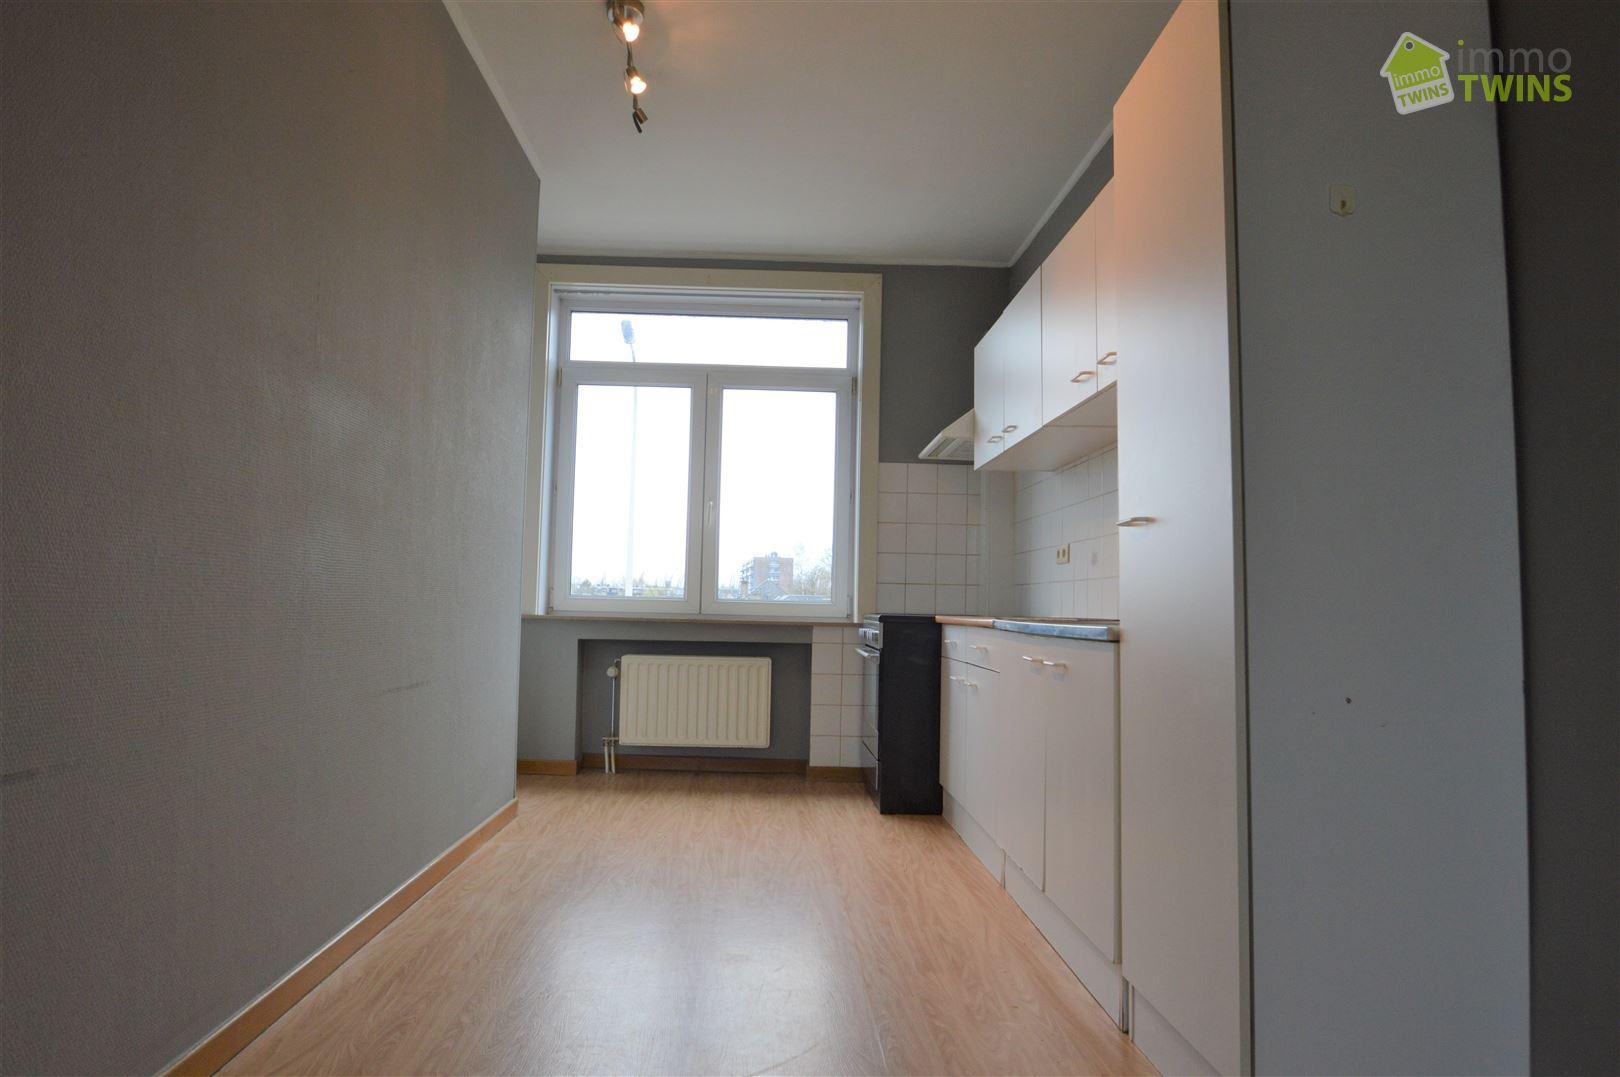 Foto 4 : Appartement te 9200 DENDERMONDE (België) - Prijs € 575